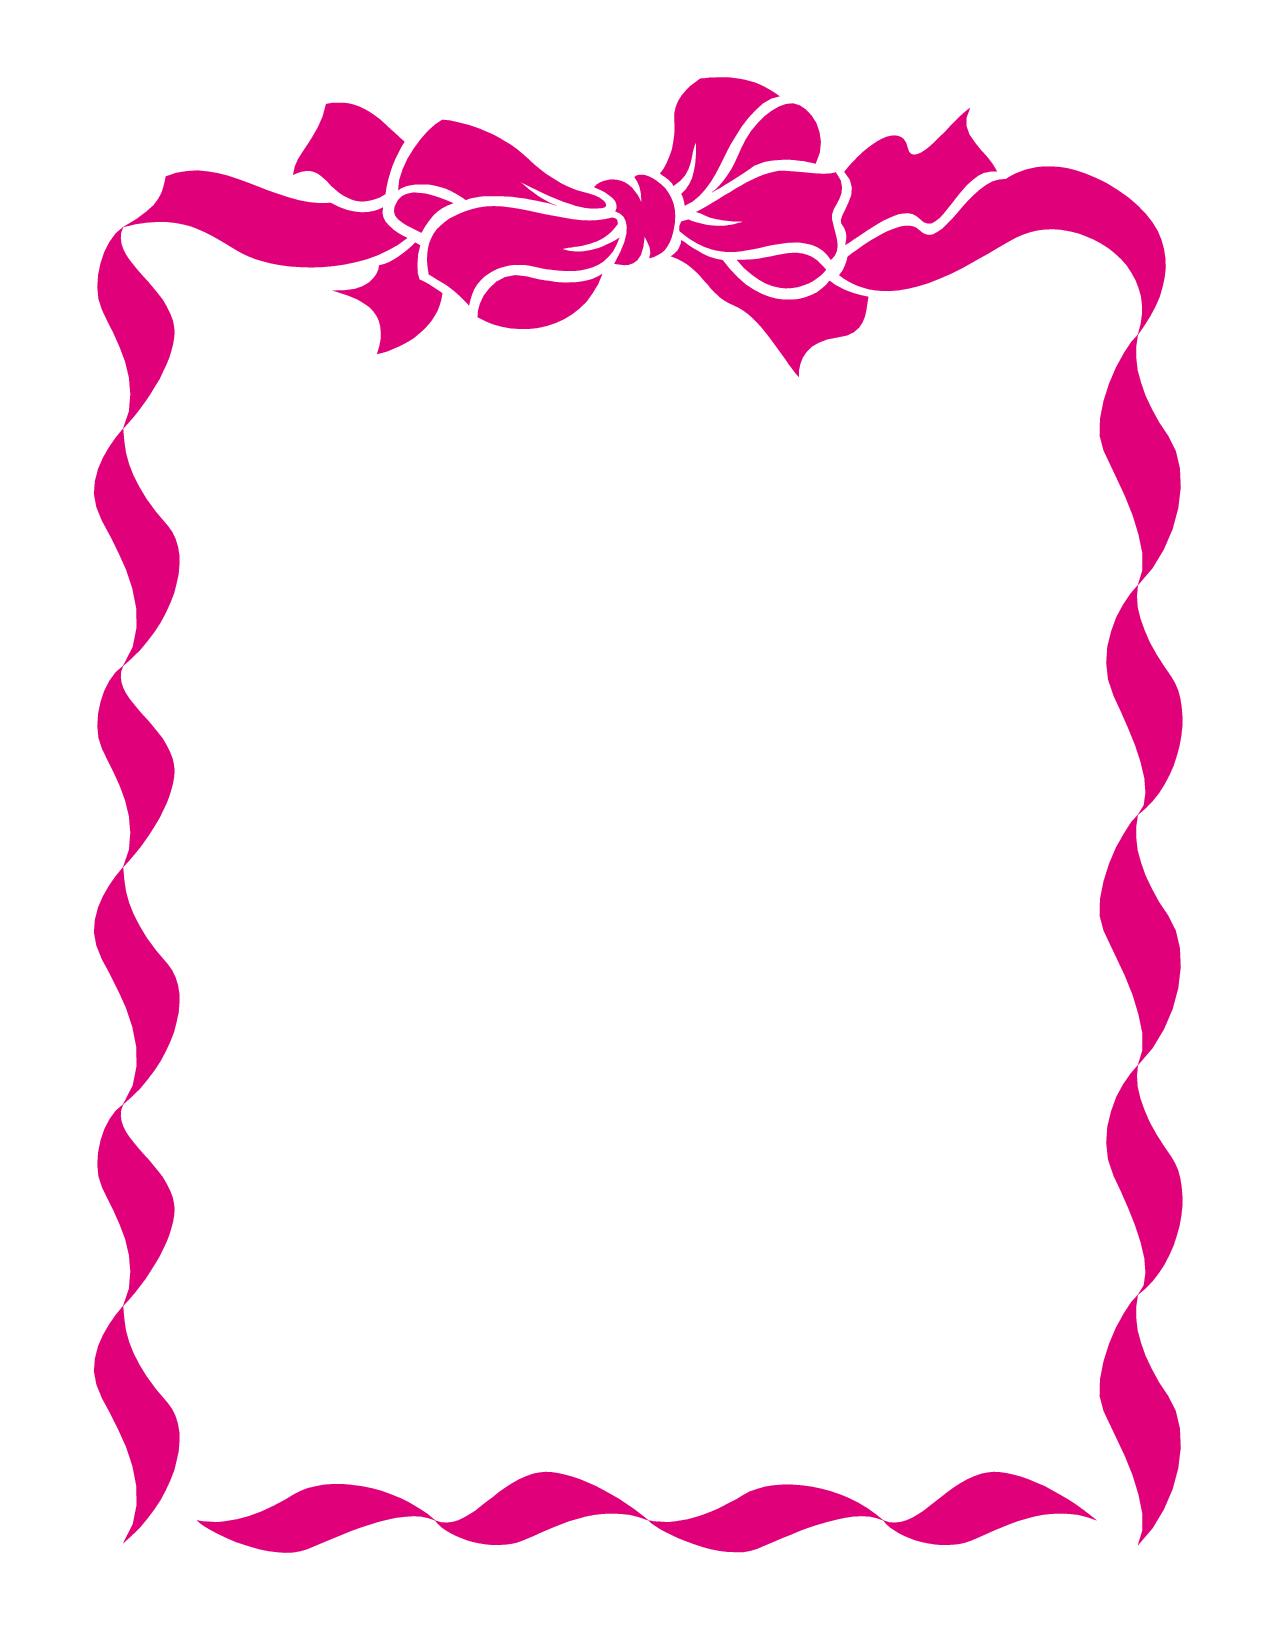 Breast Cancer Ribbon Border - Cliparts.co